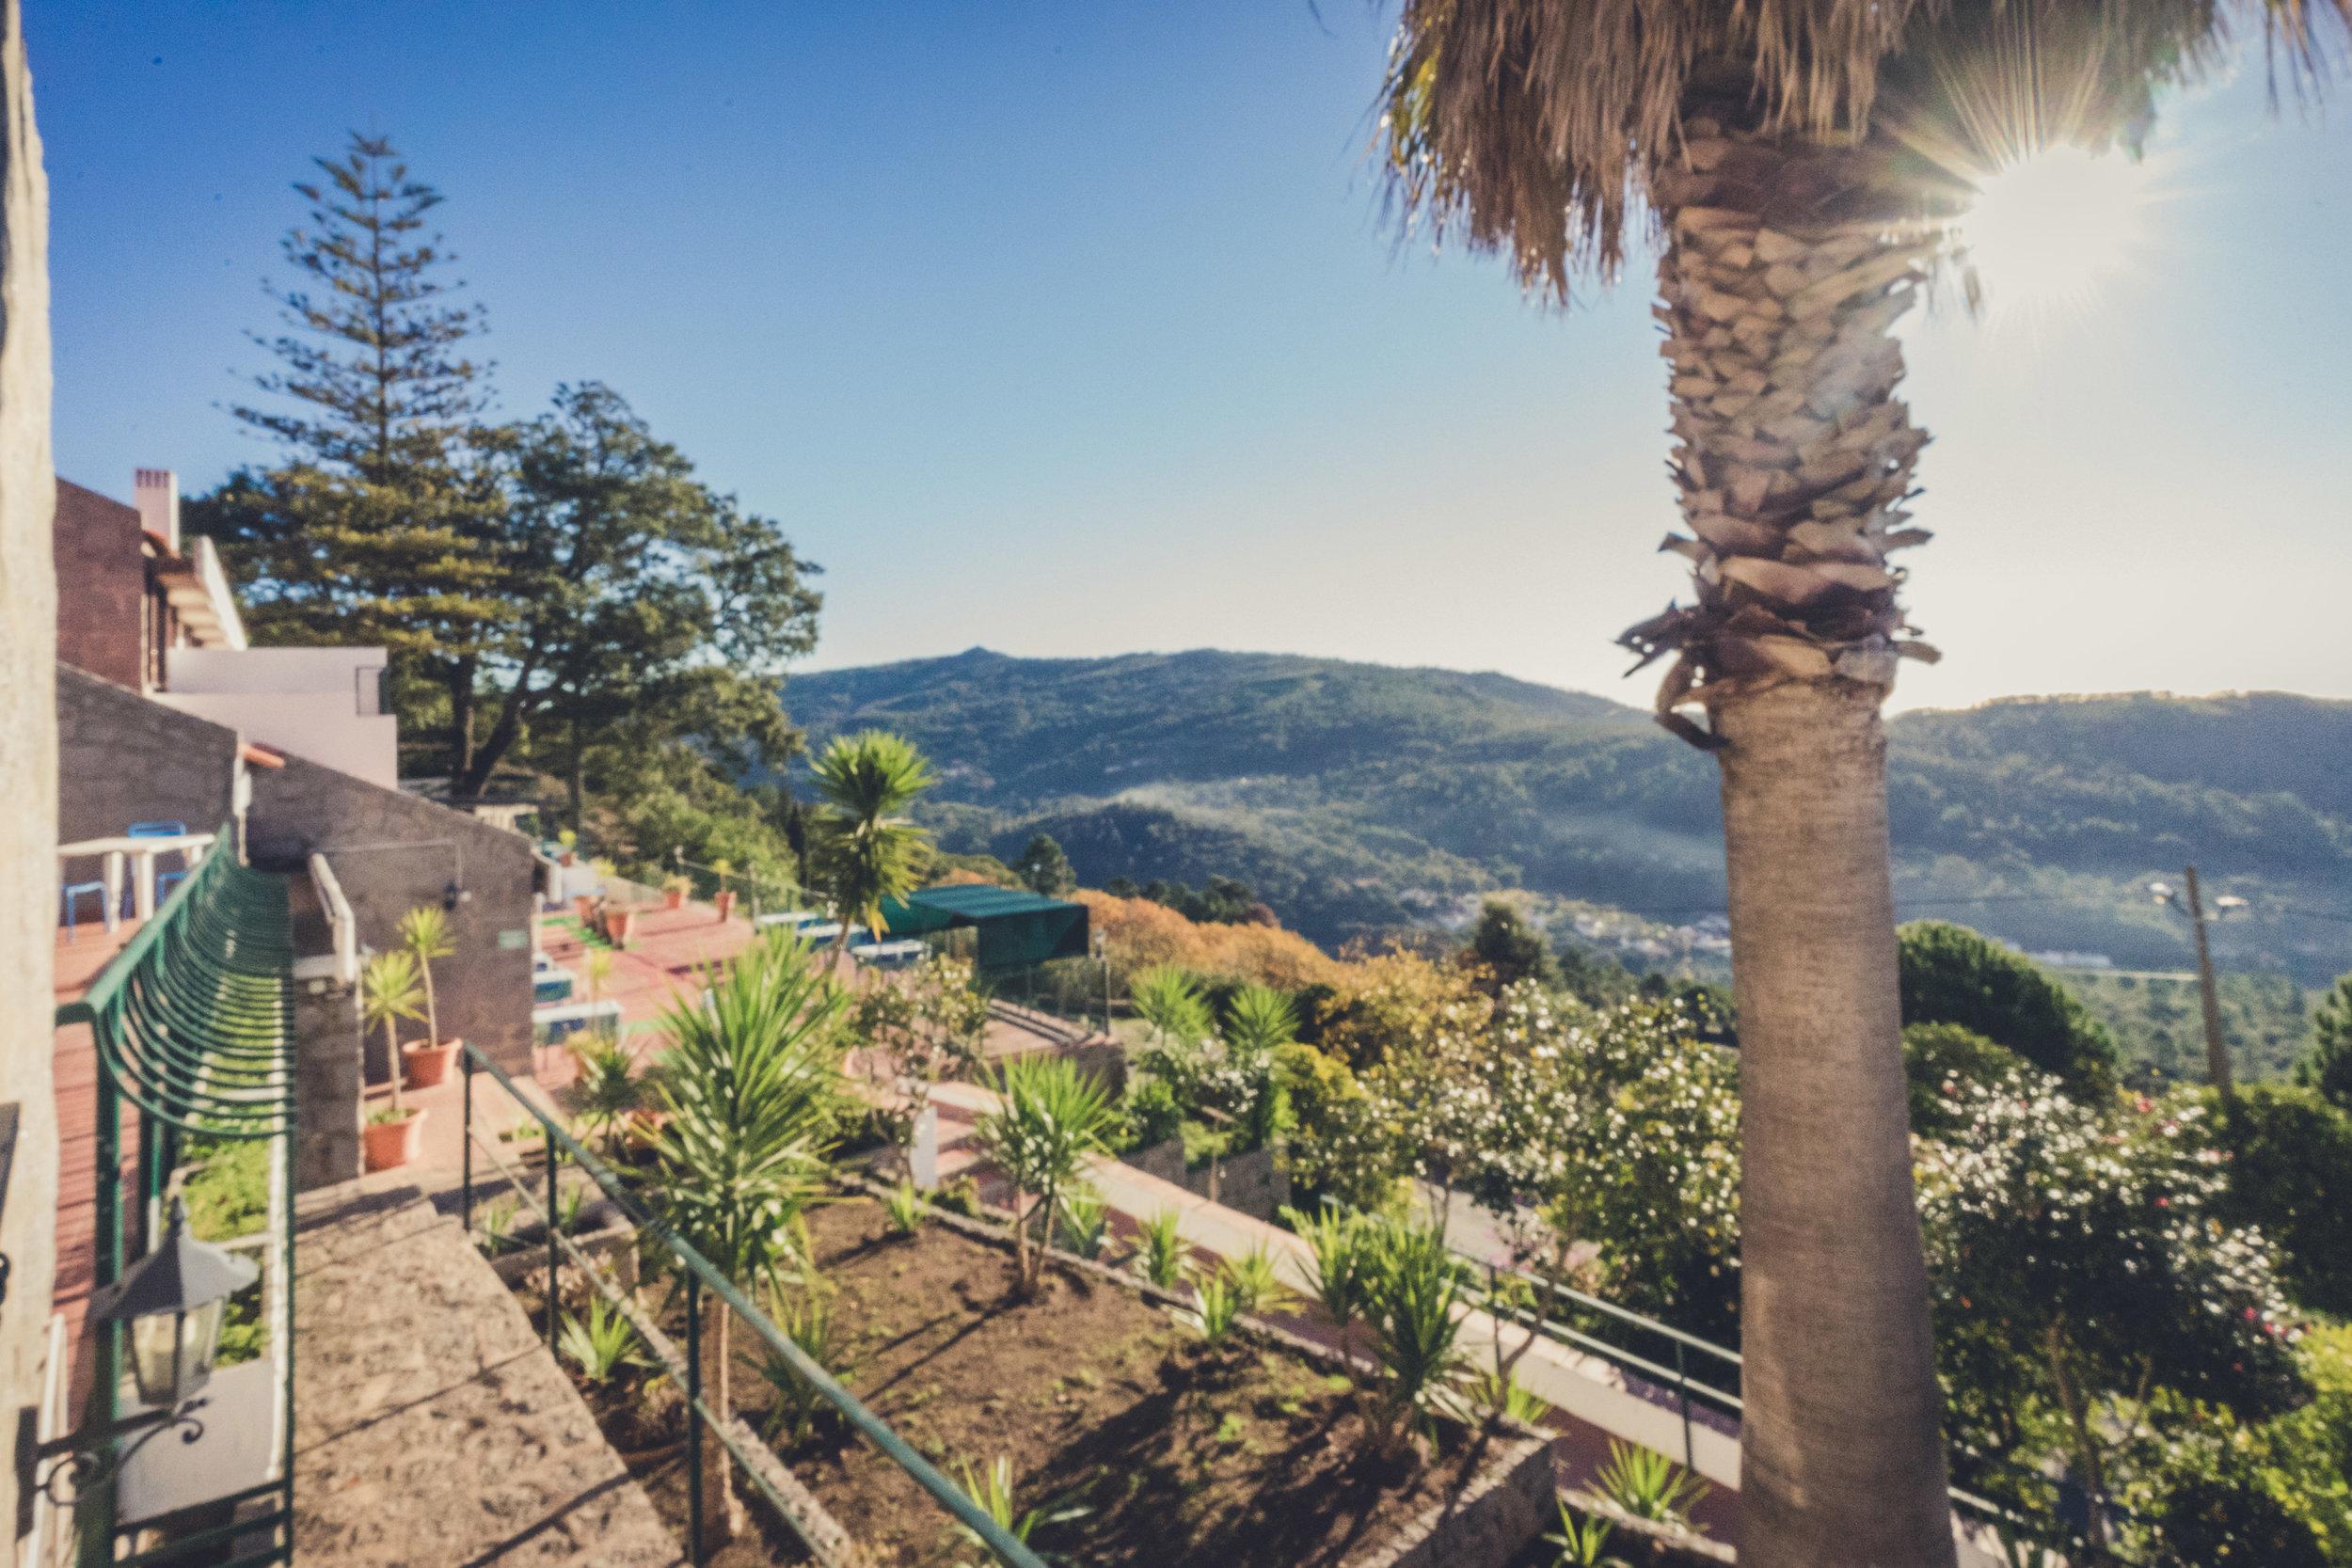 estalagem abrigo da montanha monchique portugal. view from the room. room with a view. great view from the room. big hotel.jpg